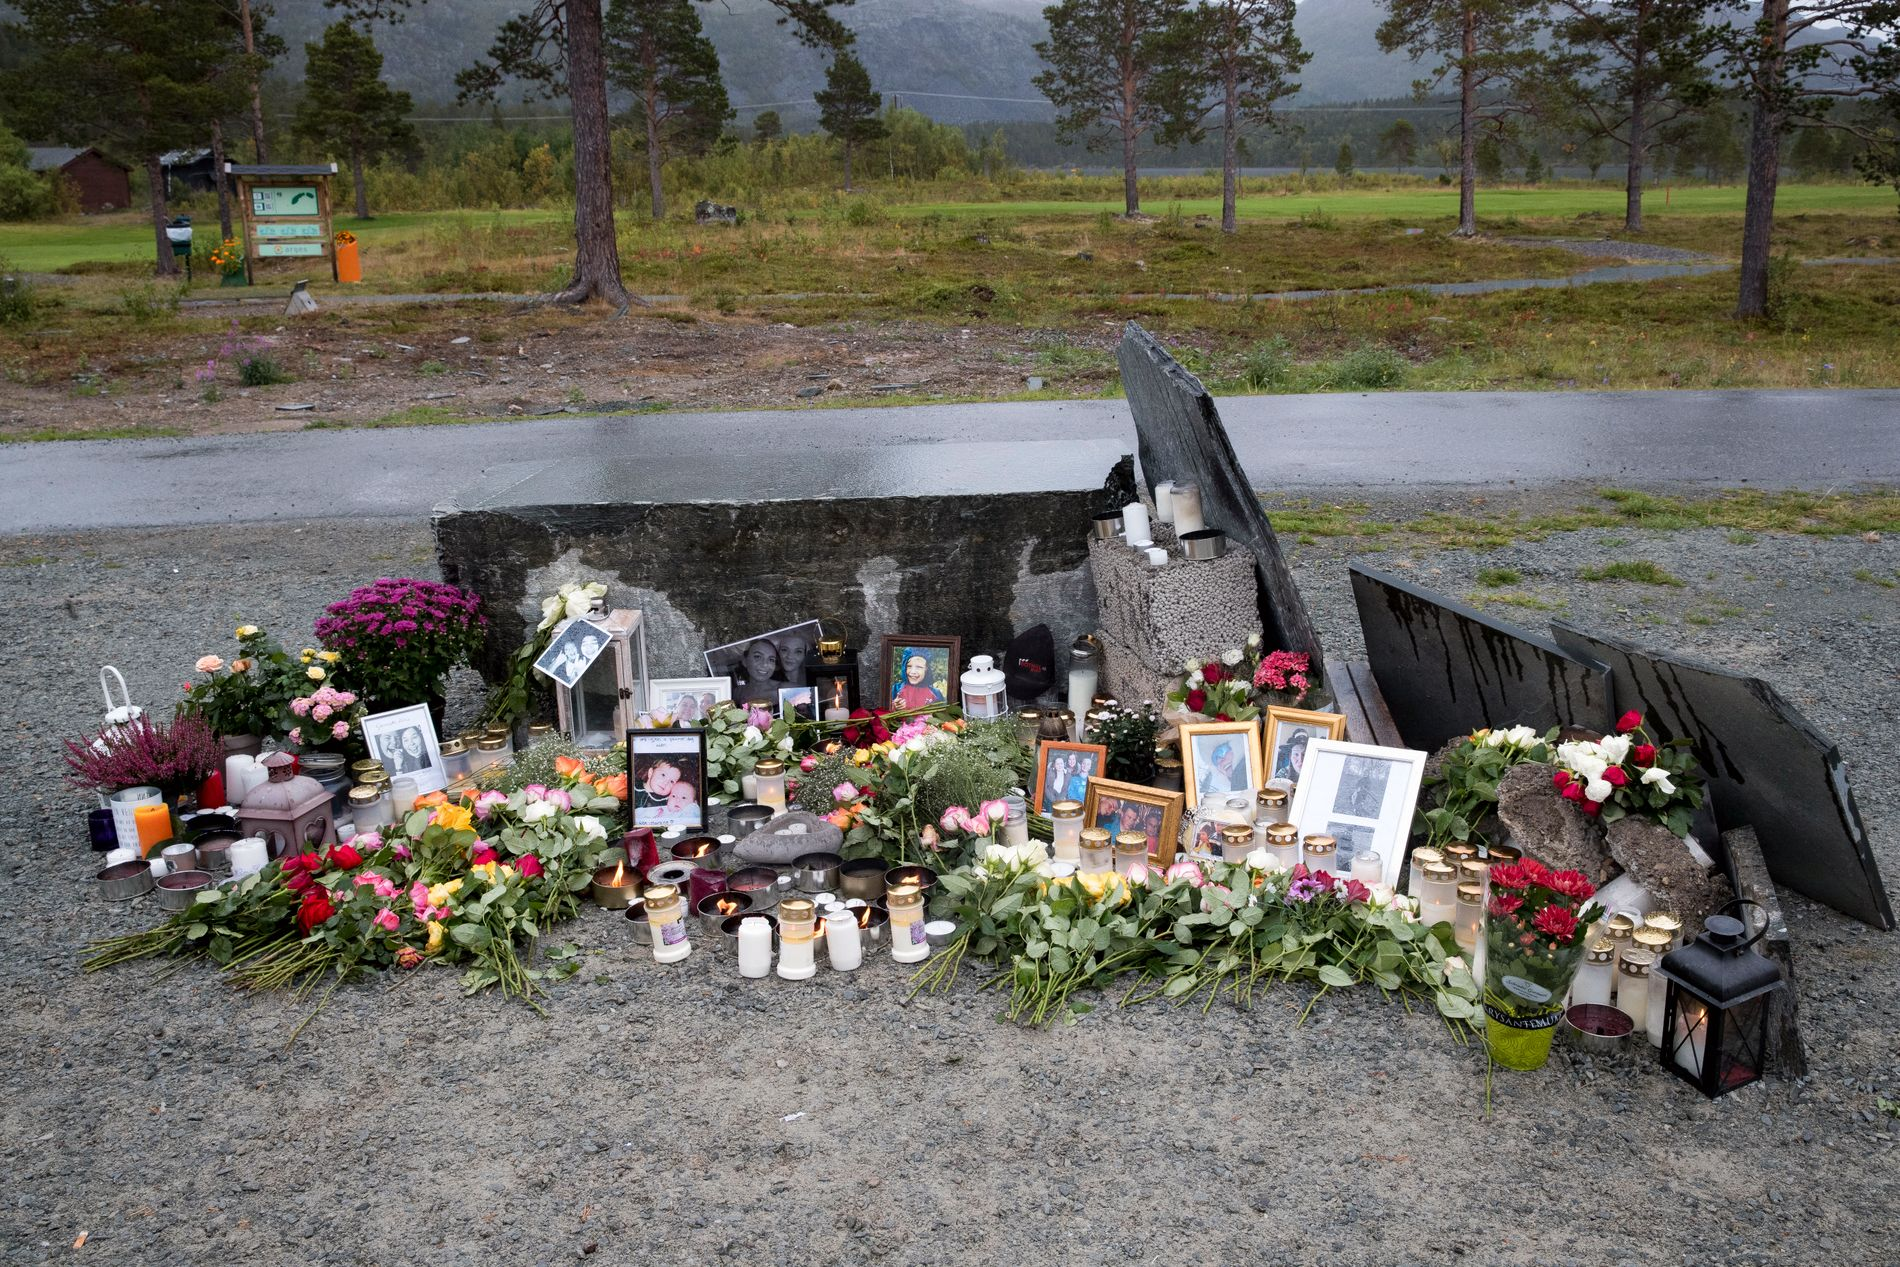 BLOMSTER: Lys og blomster på Høstsprells festivalområde.